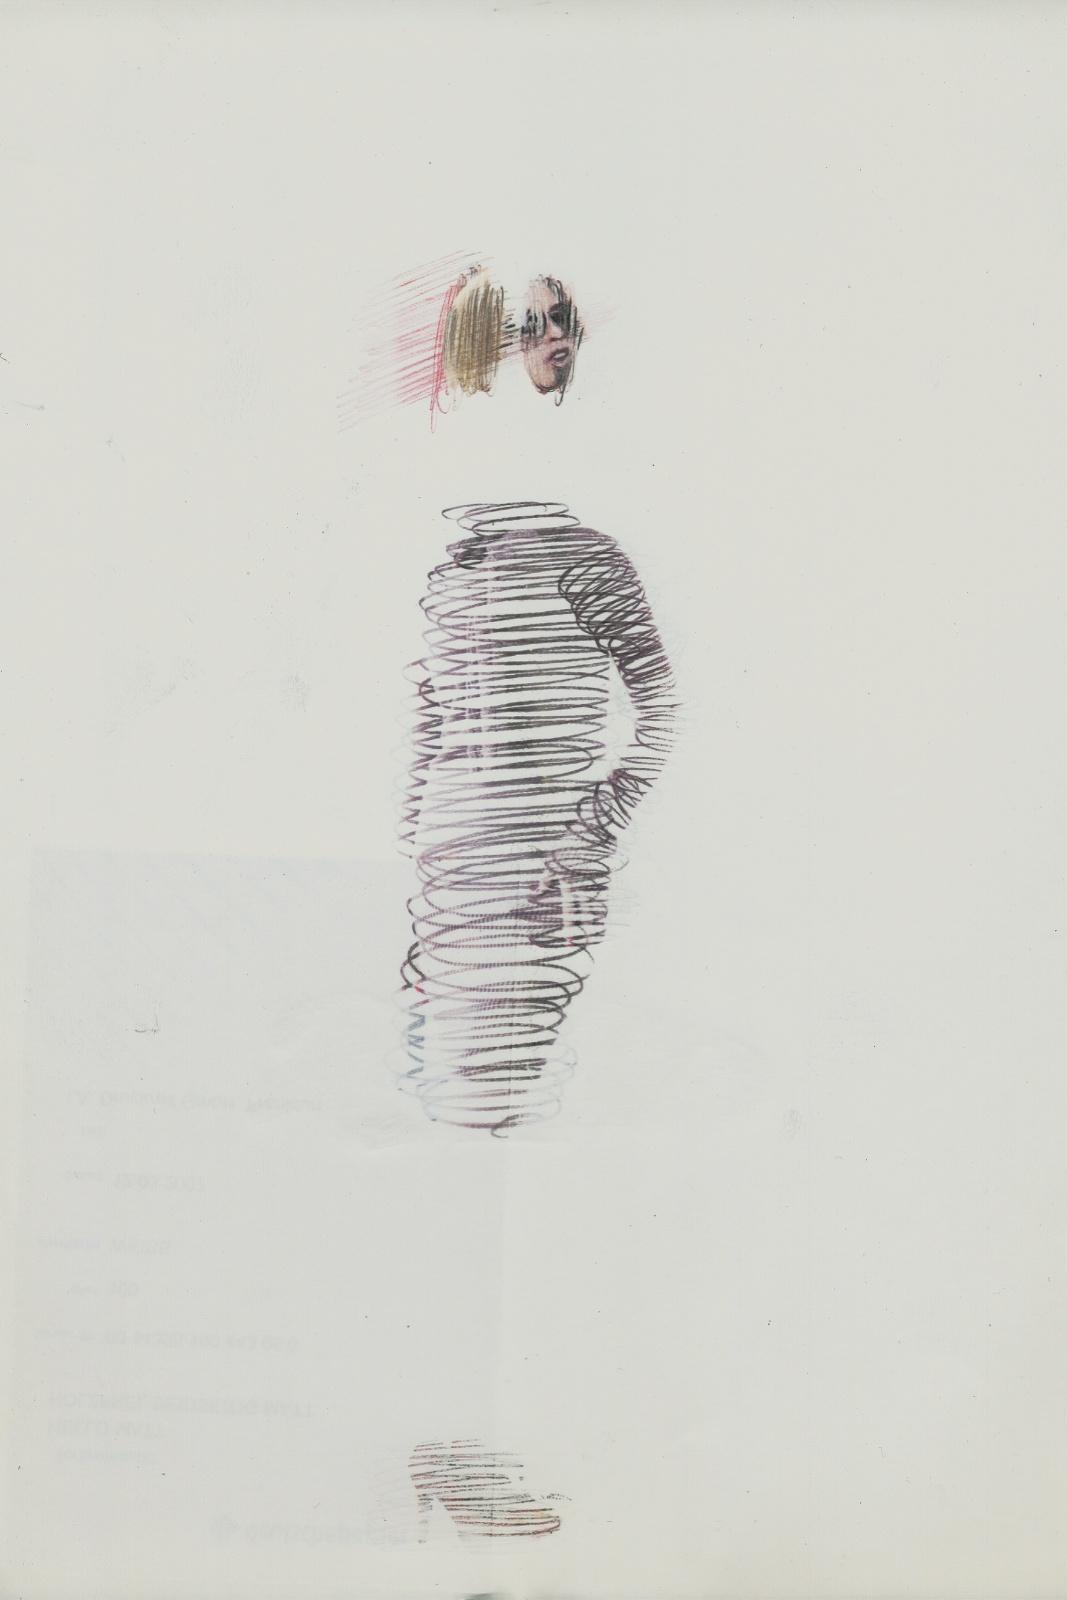 Spin #03, 2014, Lavender-Oil transferprint, pencil, 21 x 28 cm